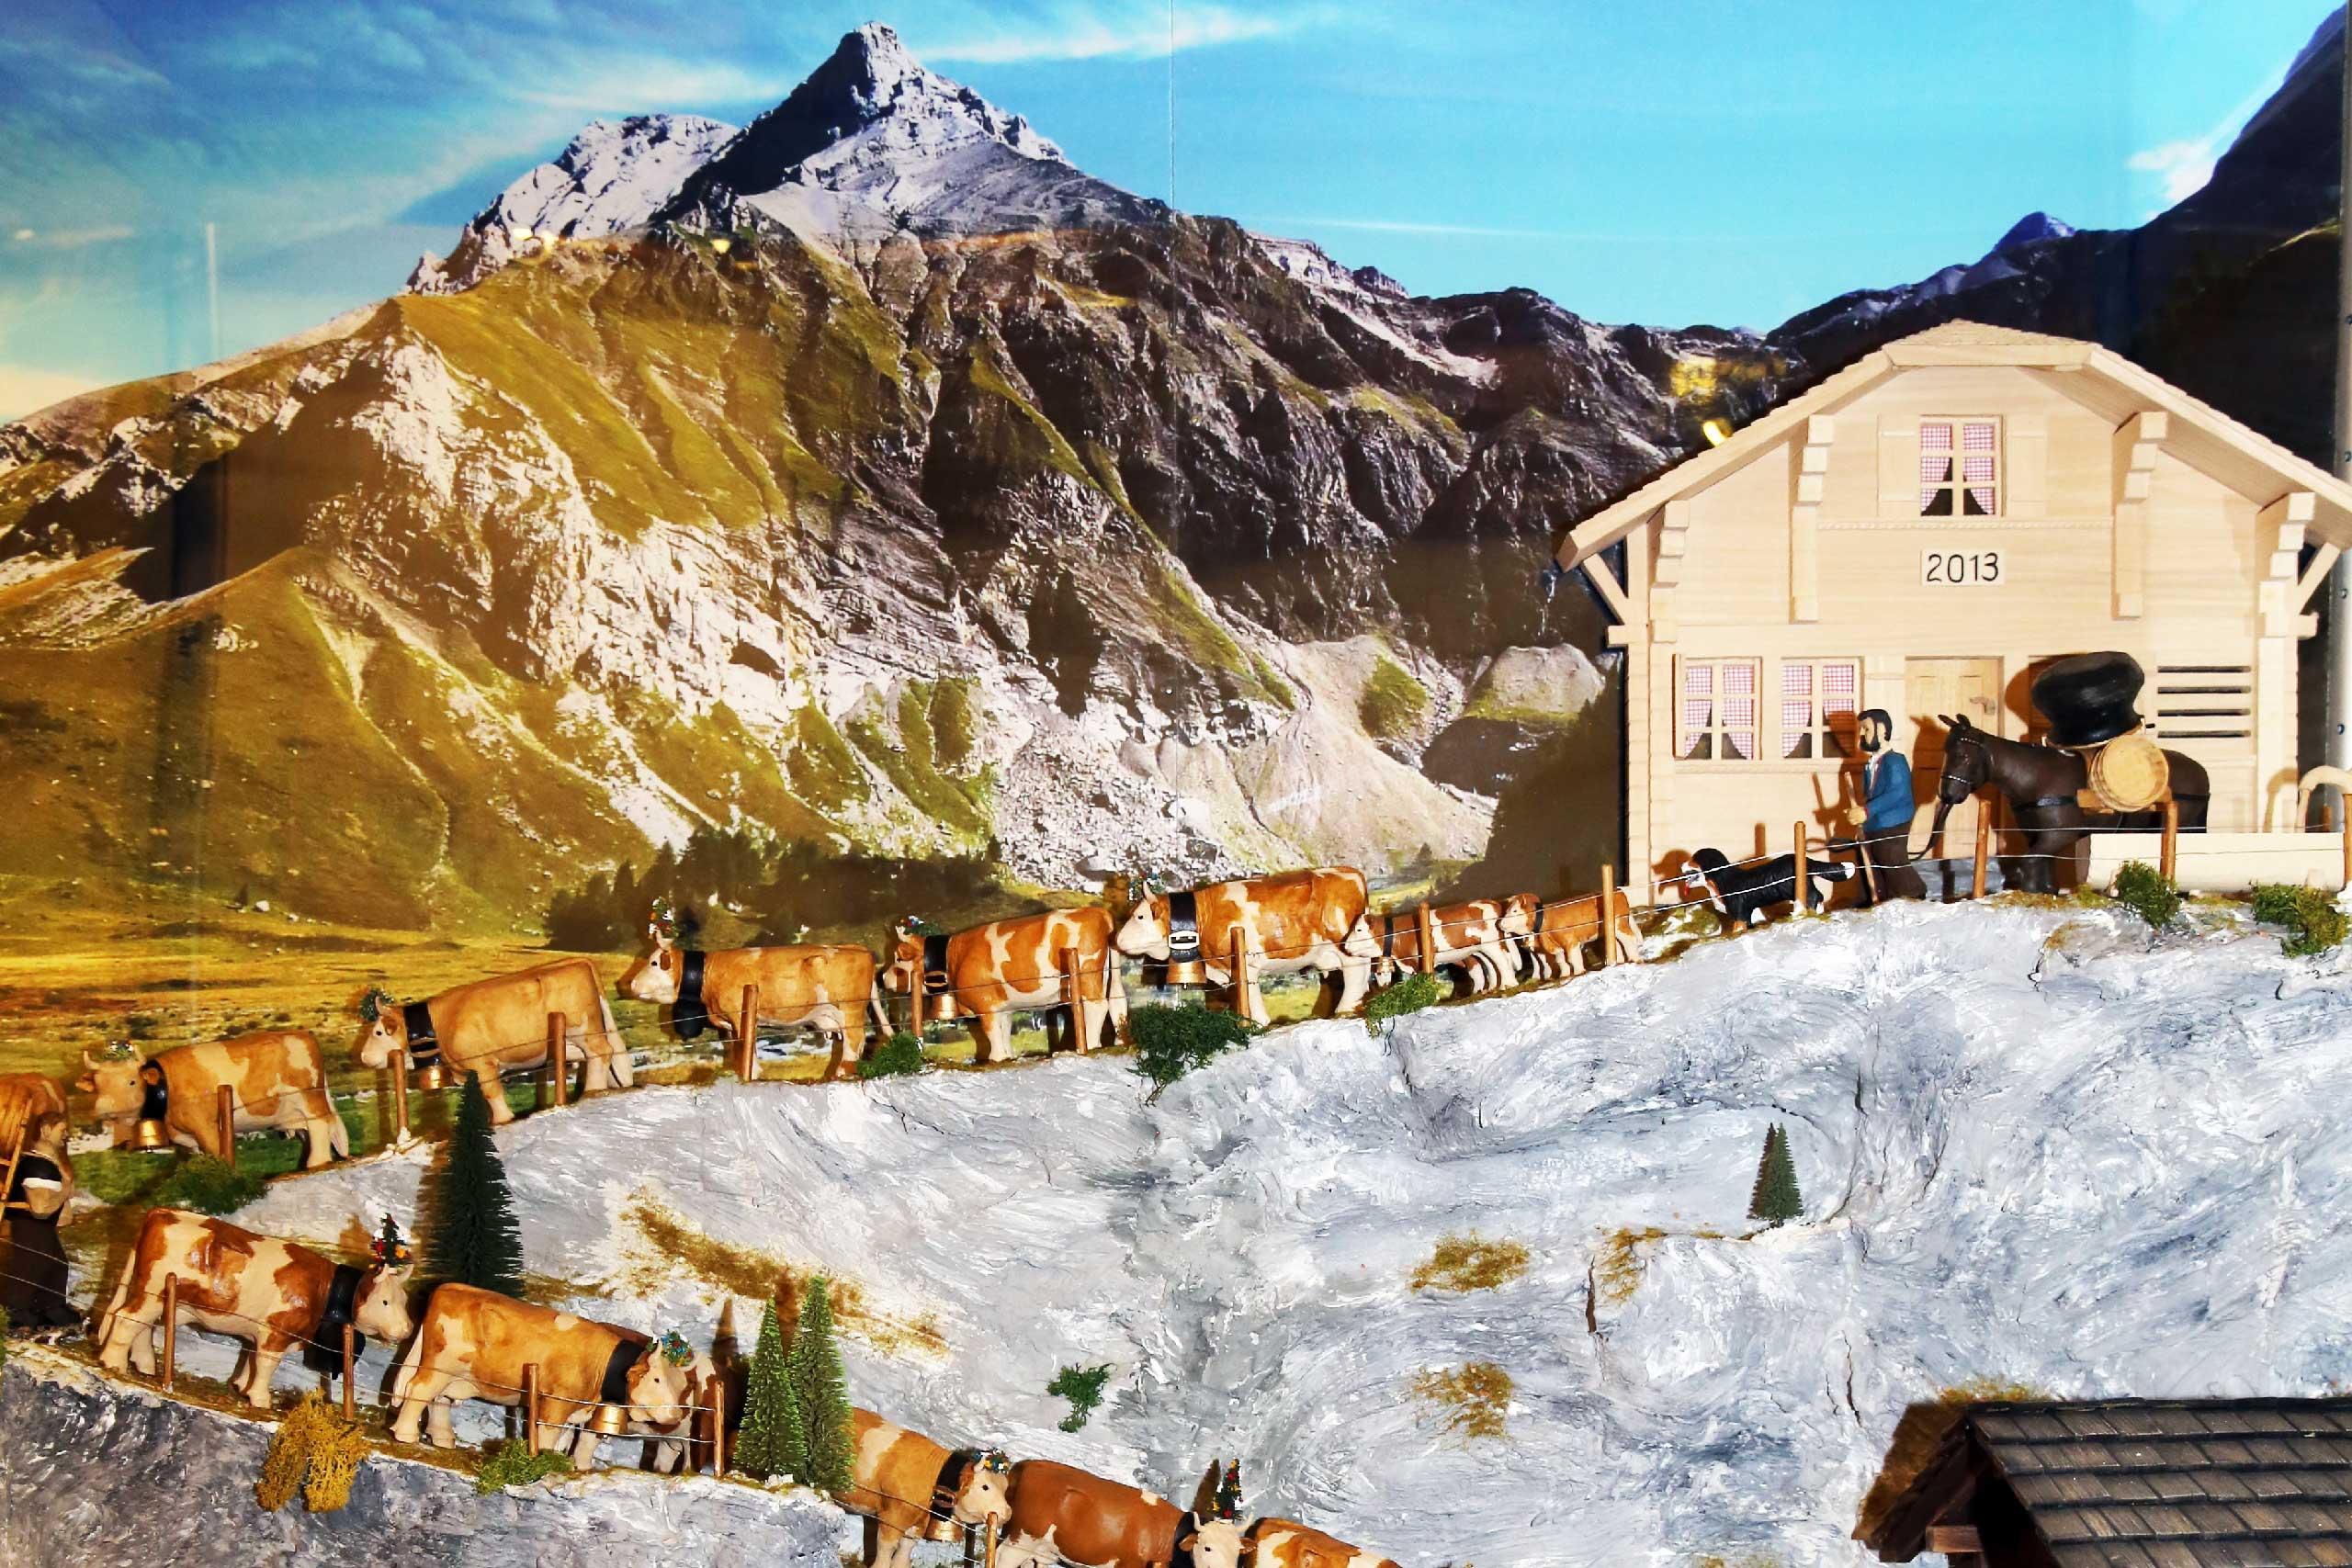 dorfmuseum-wilderwil-alpendiorama-alpabzug